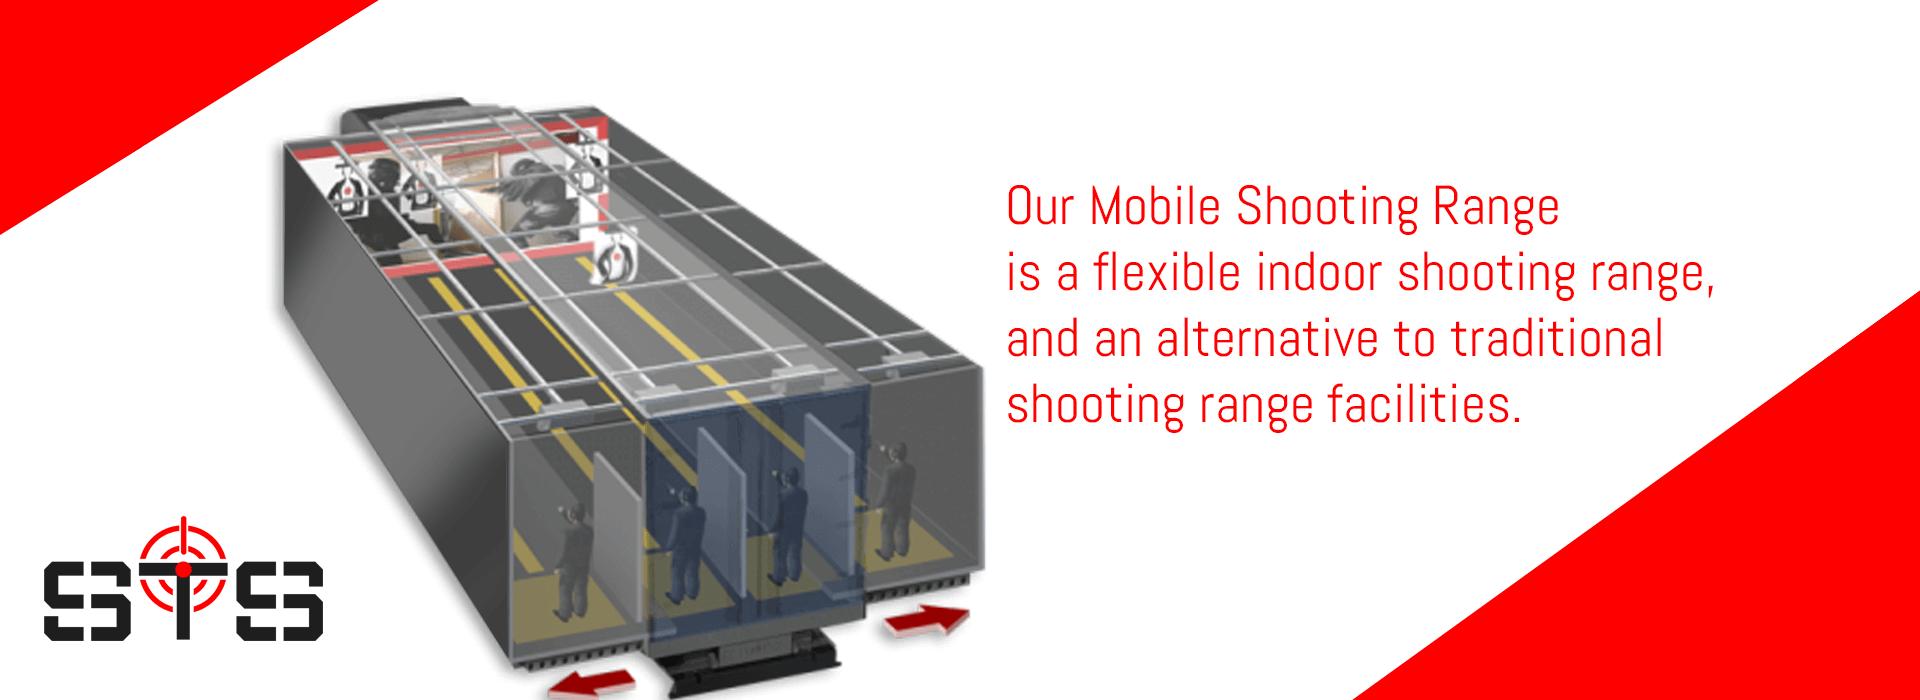 Moblie-Shooting-Range-05082018